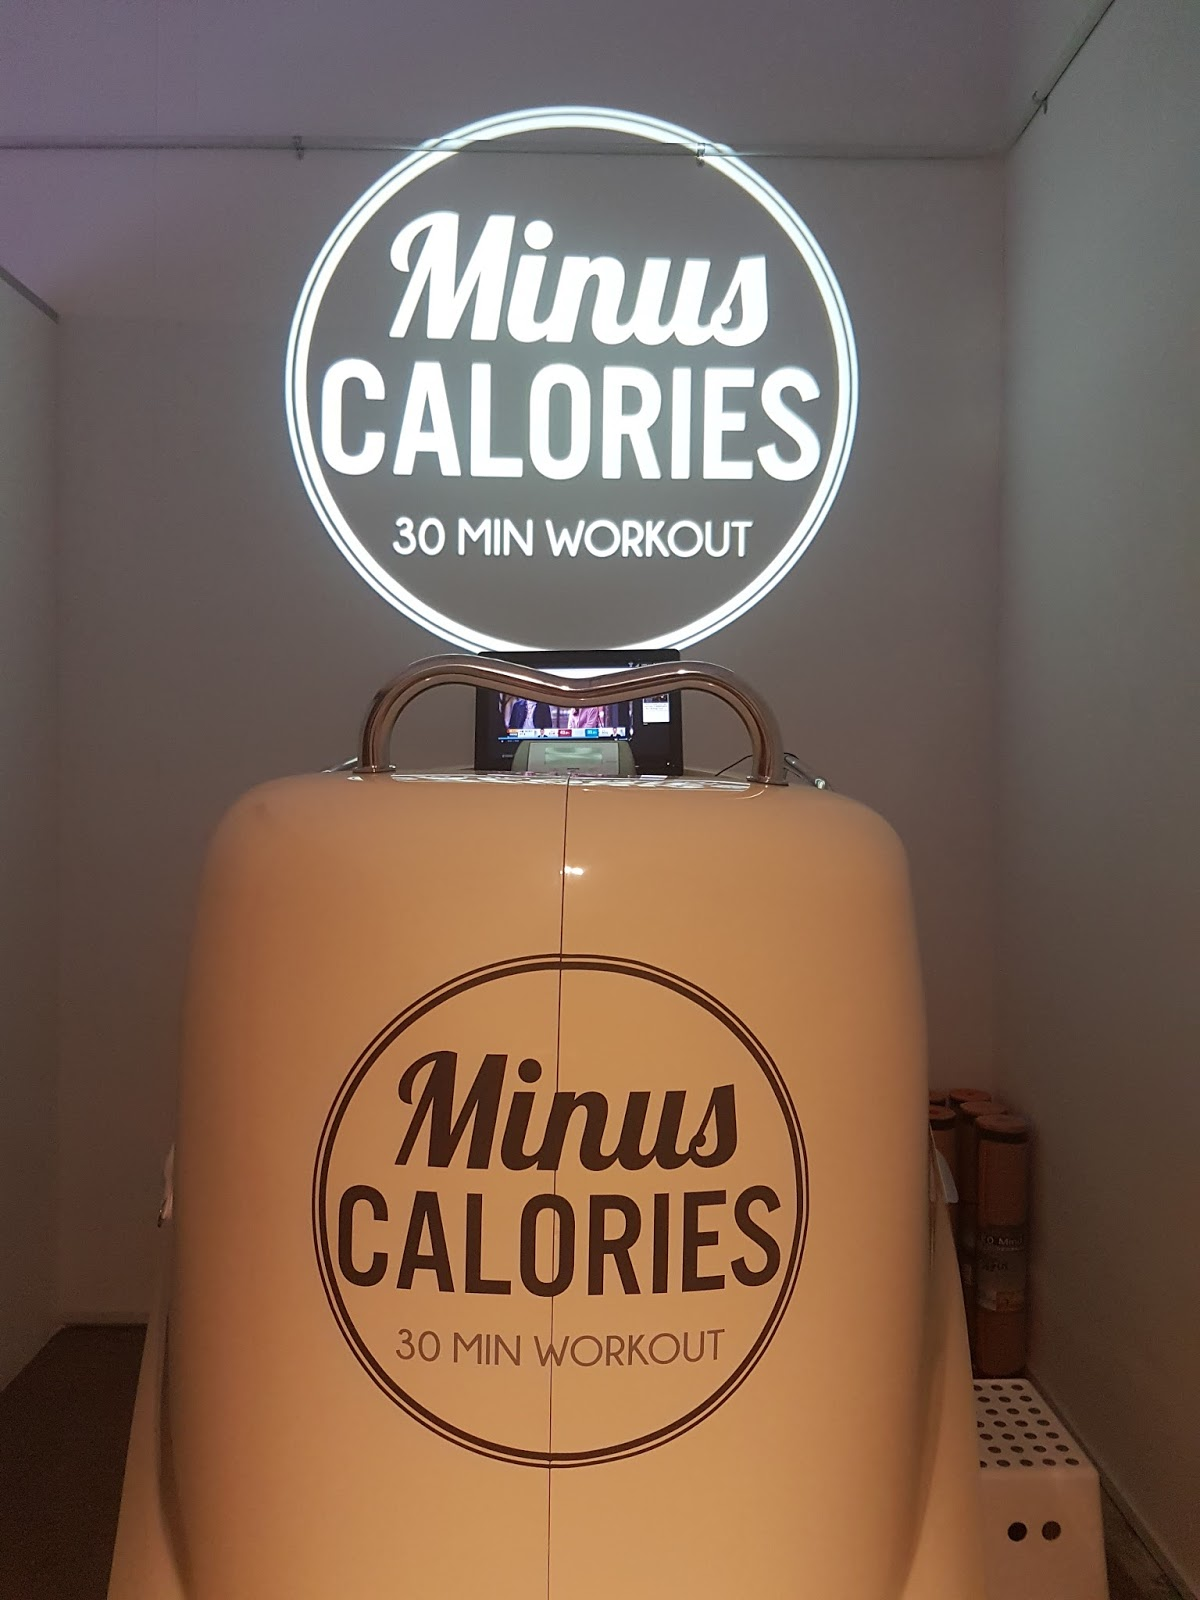 elliptical machine calorie